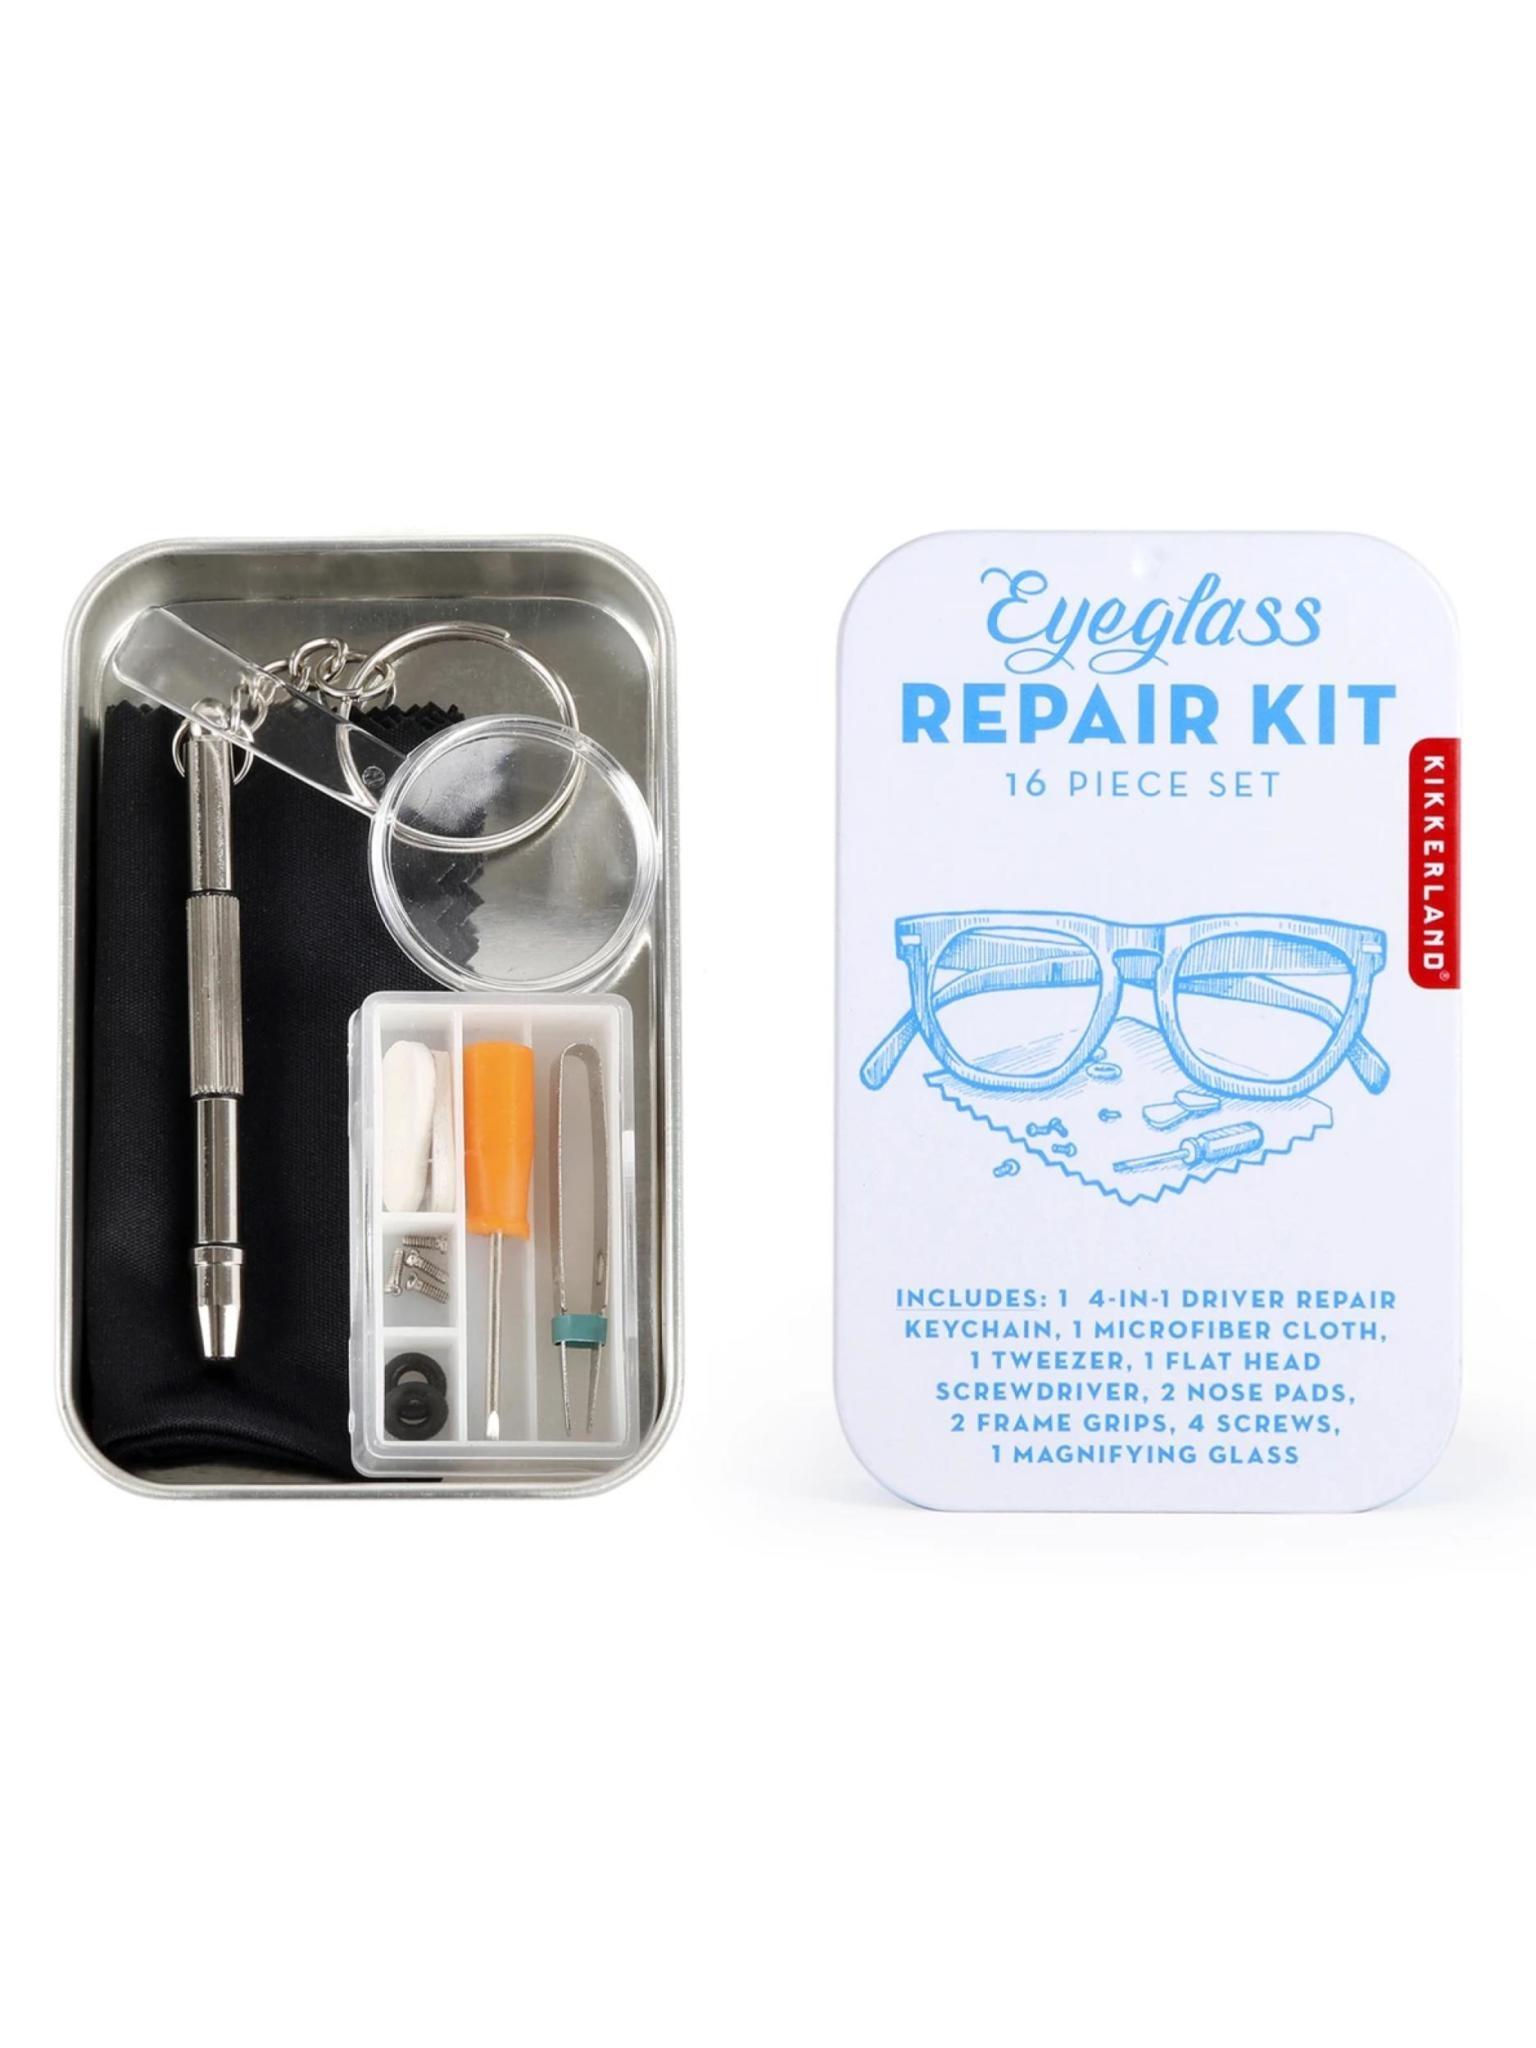 Kikkerland Eyeglass Repair Kit